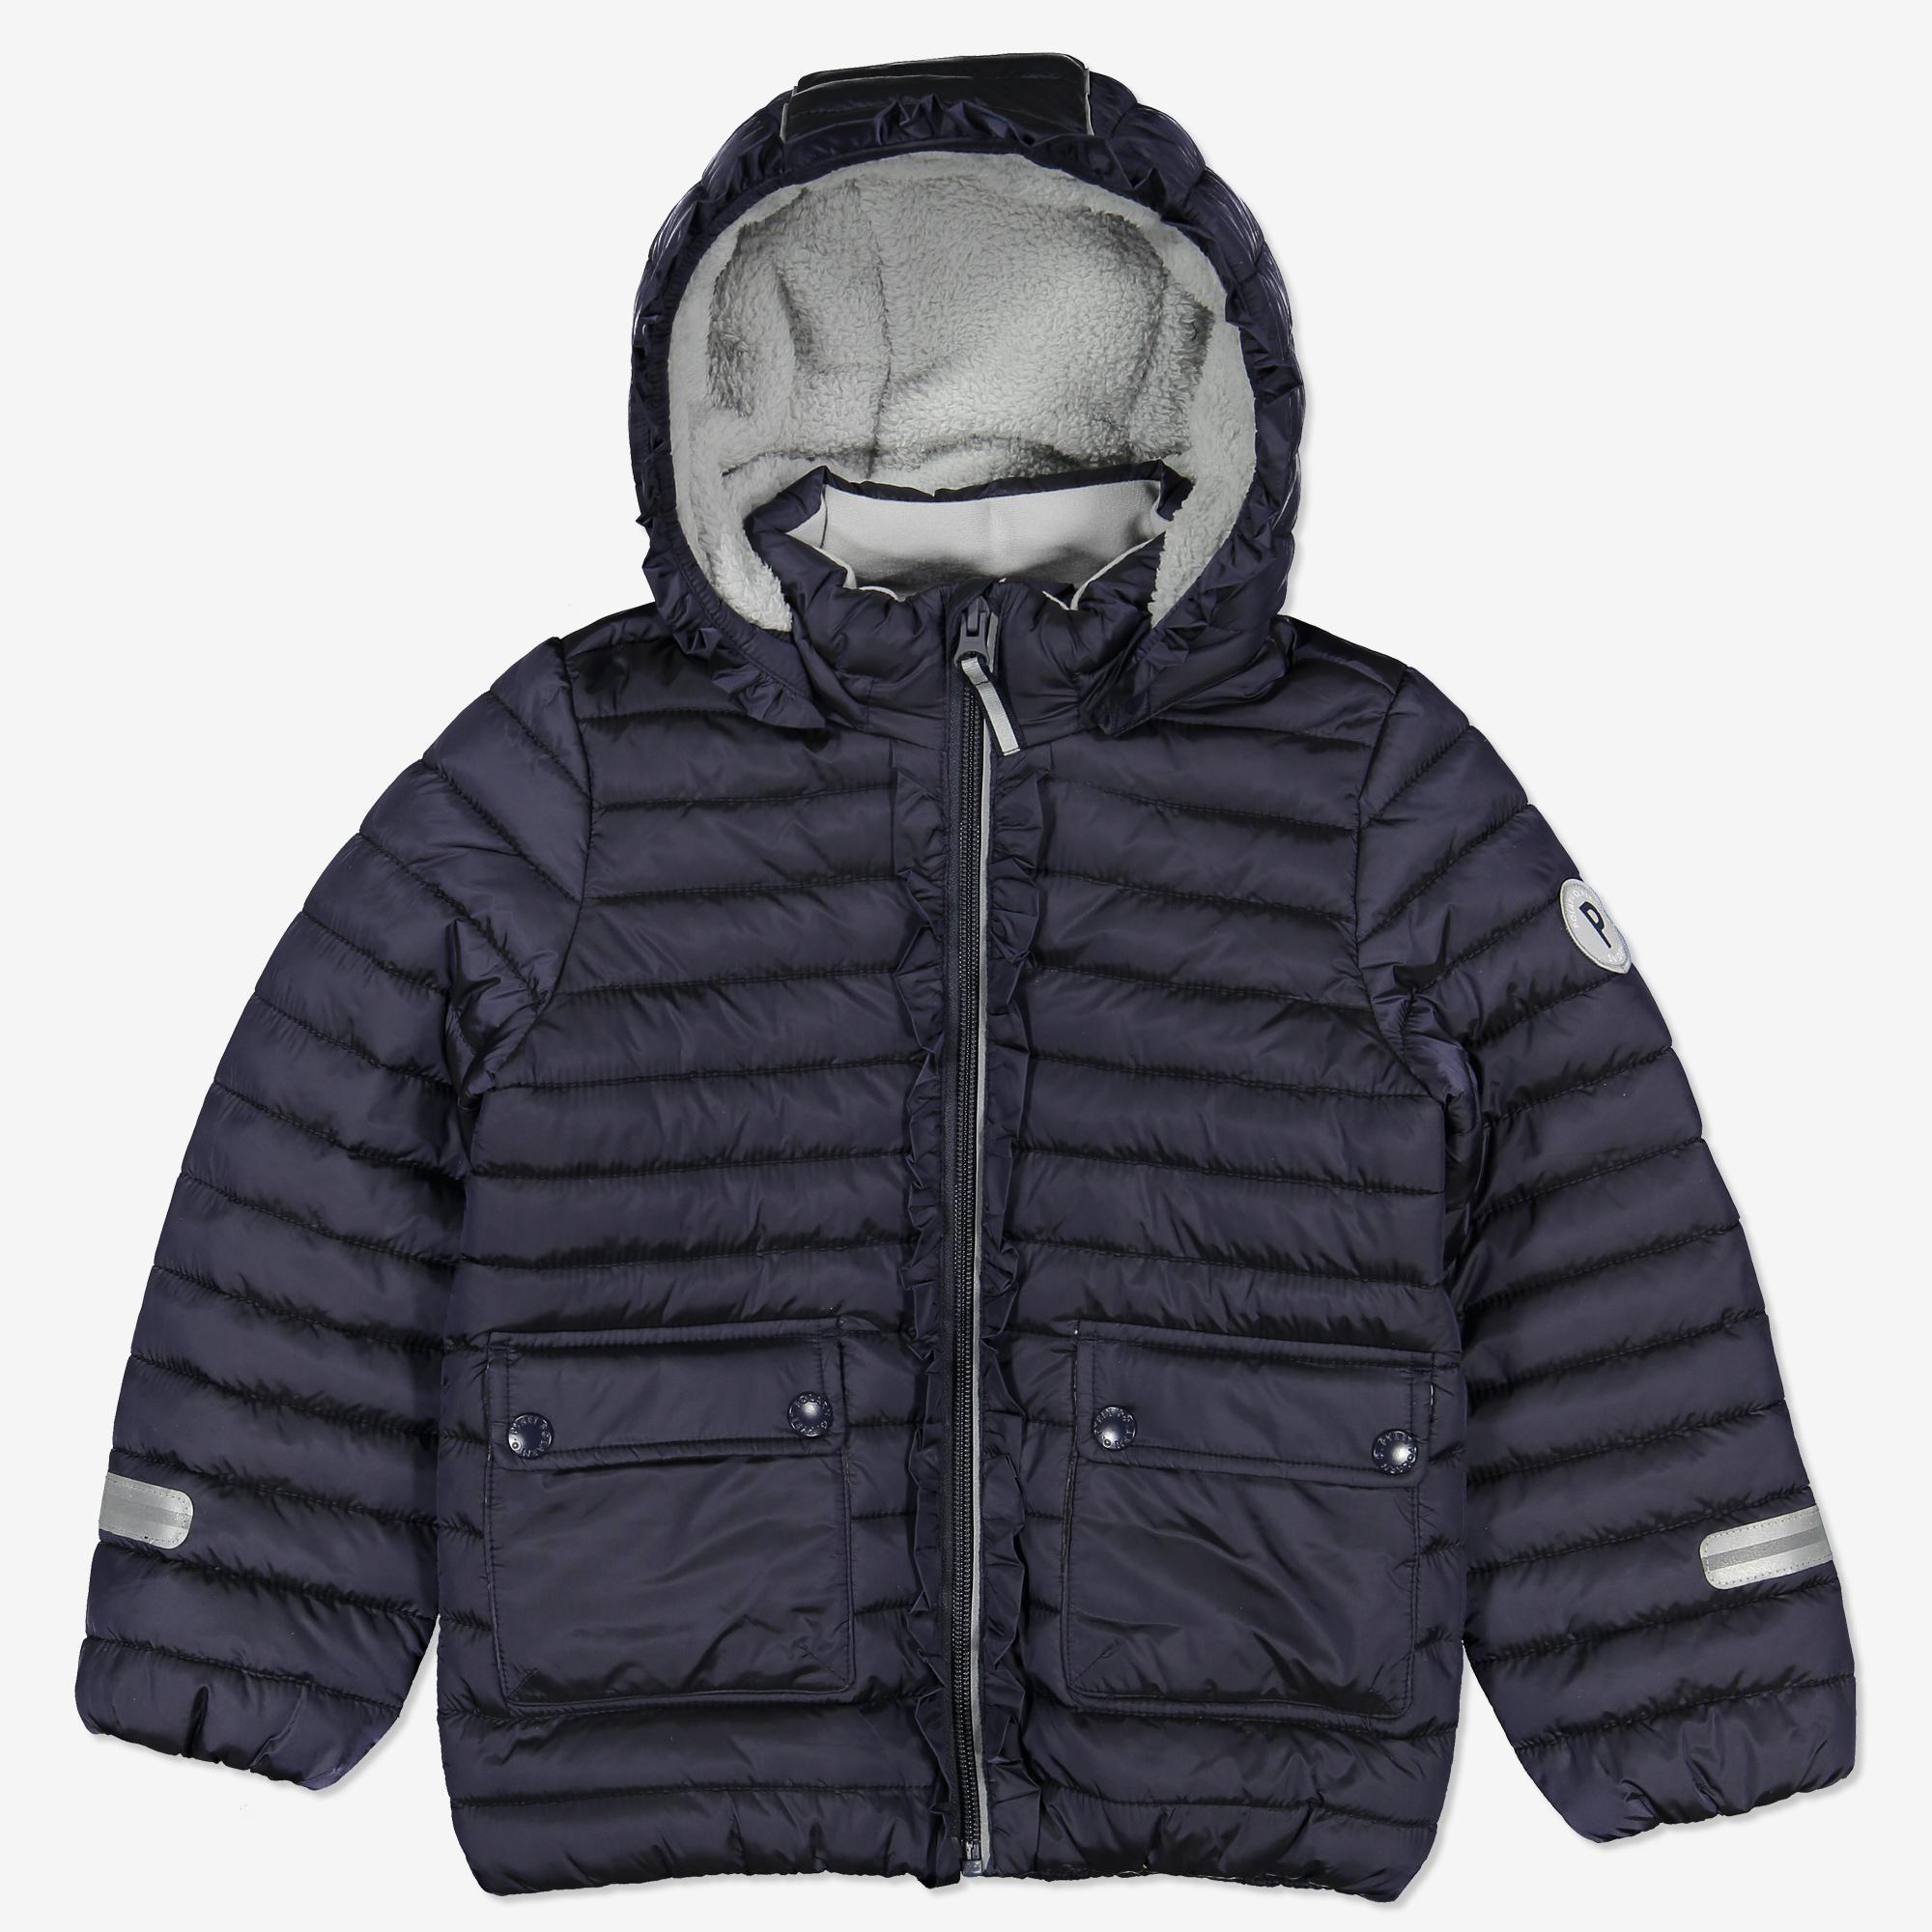 79ac47f31 Lett jakke med volang blå | Polarnopyret.no